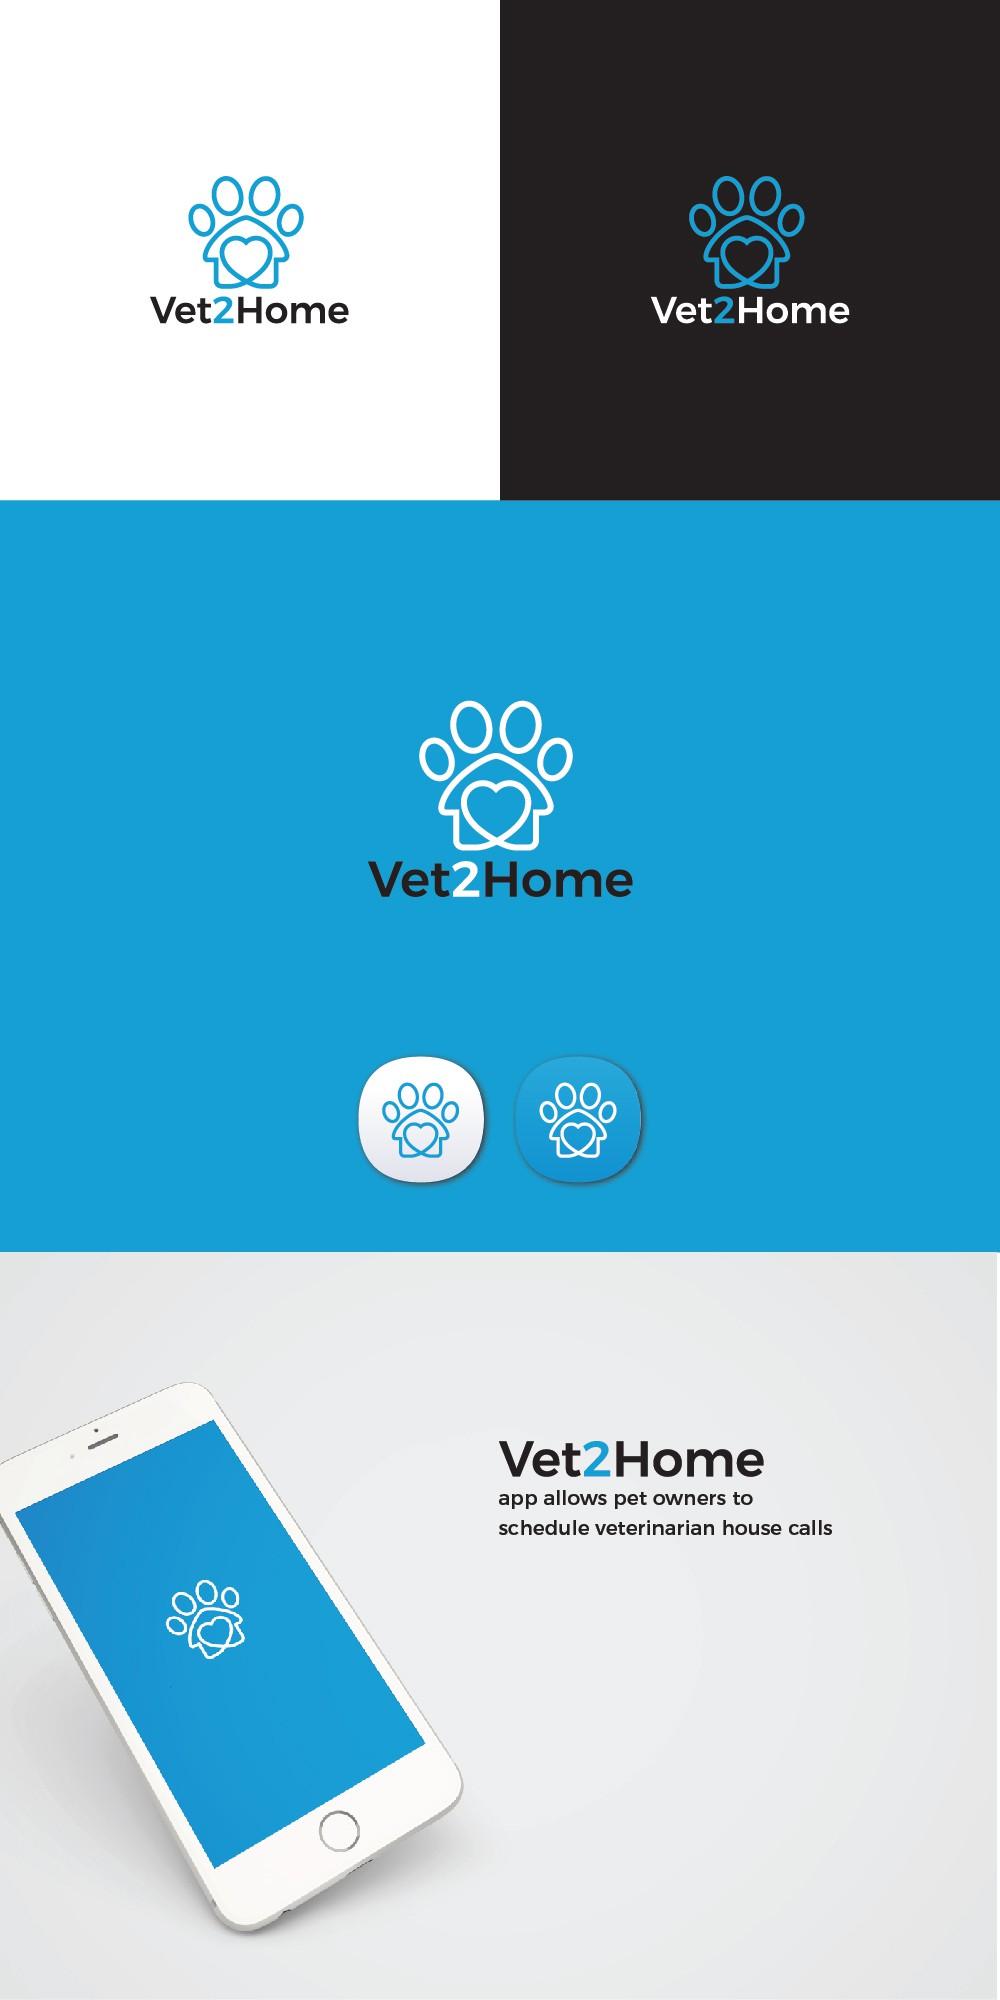 Home visit veterinary company needs a crisp/clean logo